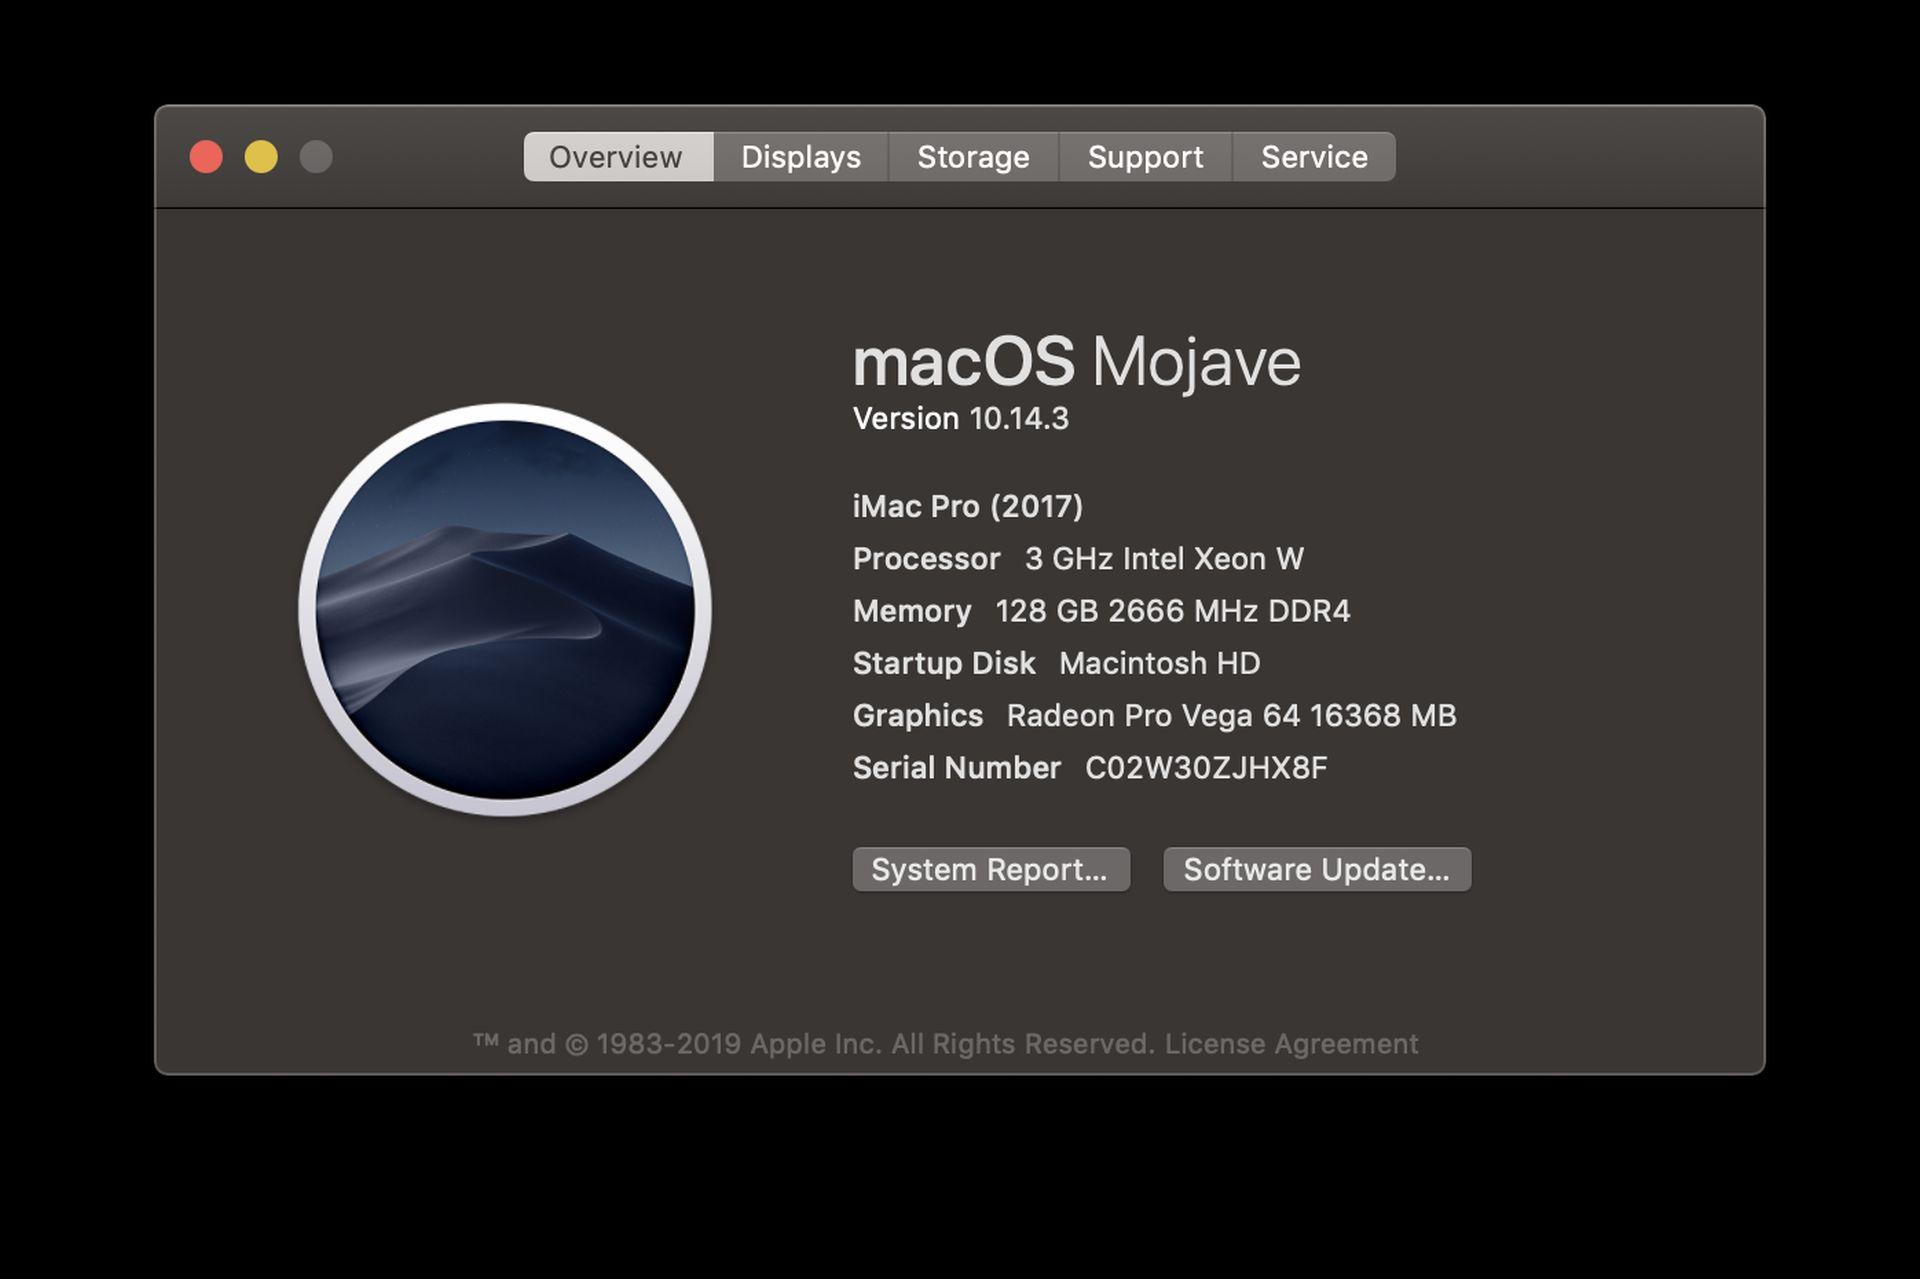 Top: Romero at his iMac. Bottom: A closer look at Romero's iMac specs. (Images courtesy of John Romero.)